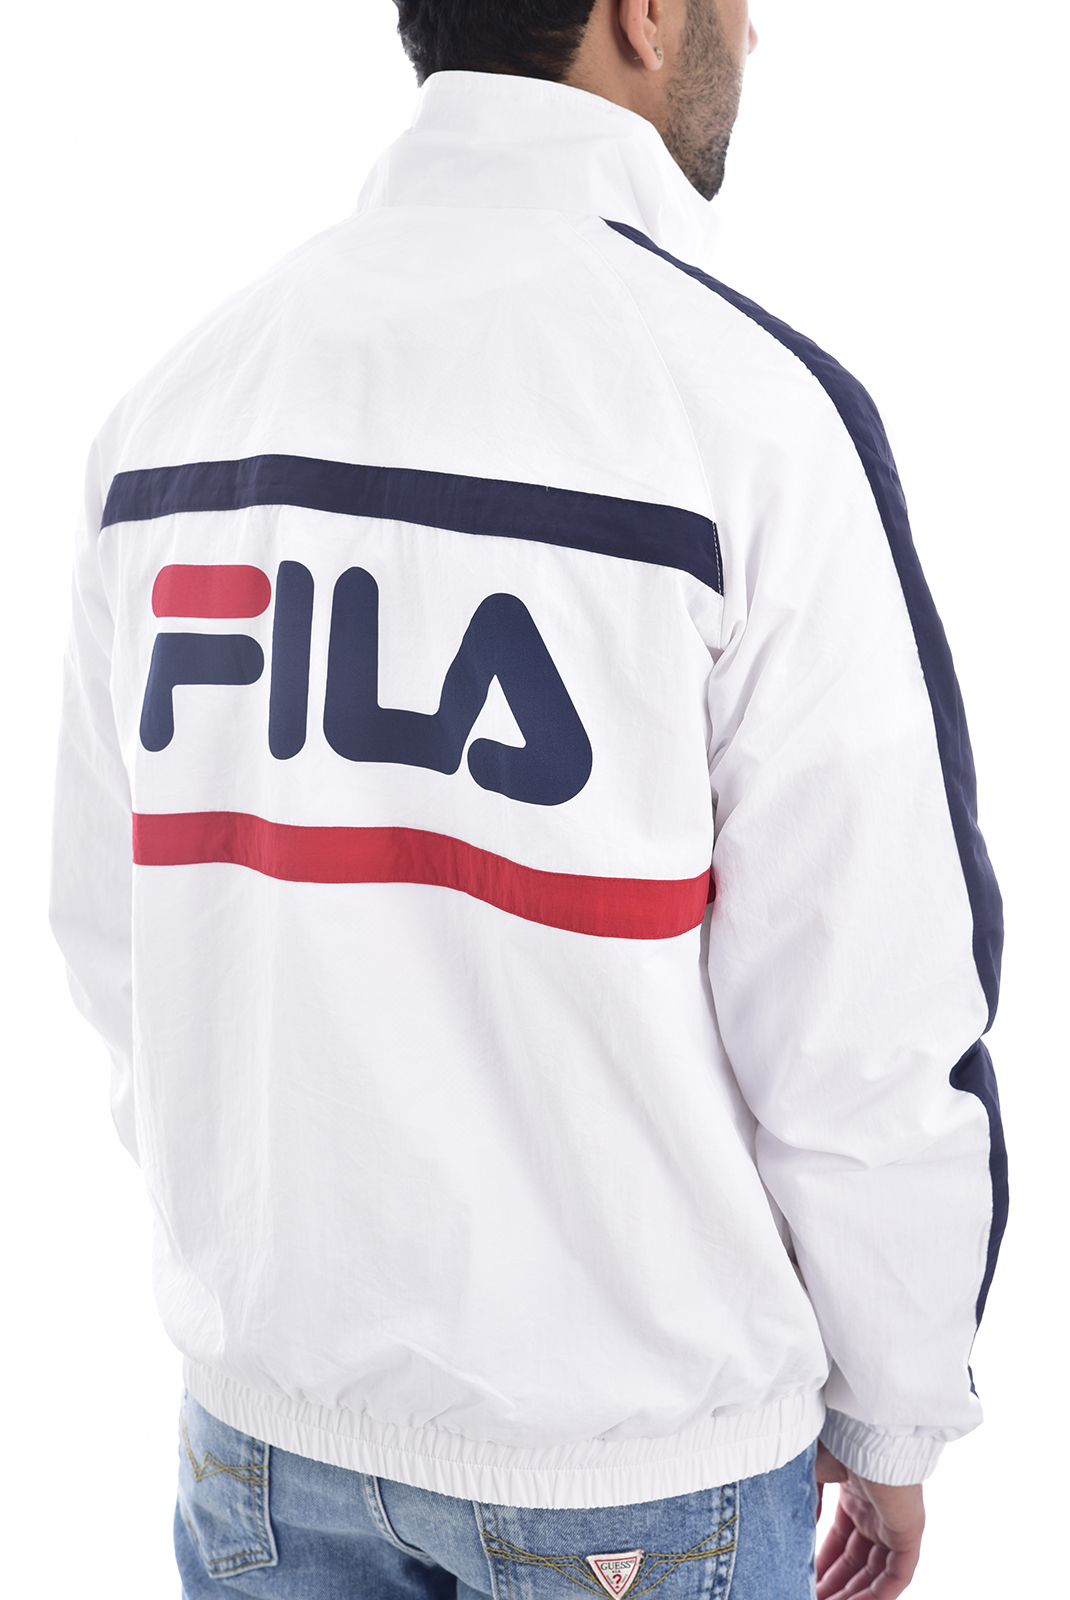 Sweatshirts  Fila 687032 JONA K15 bright white-black iris-true red